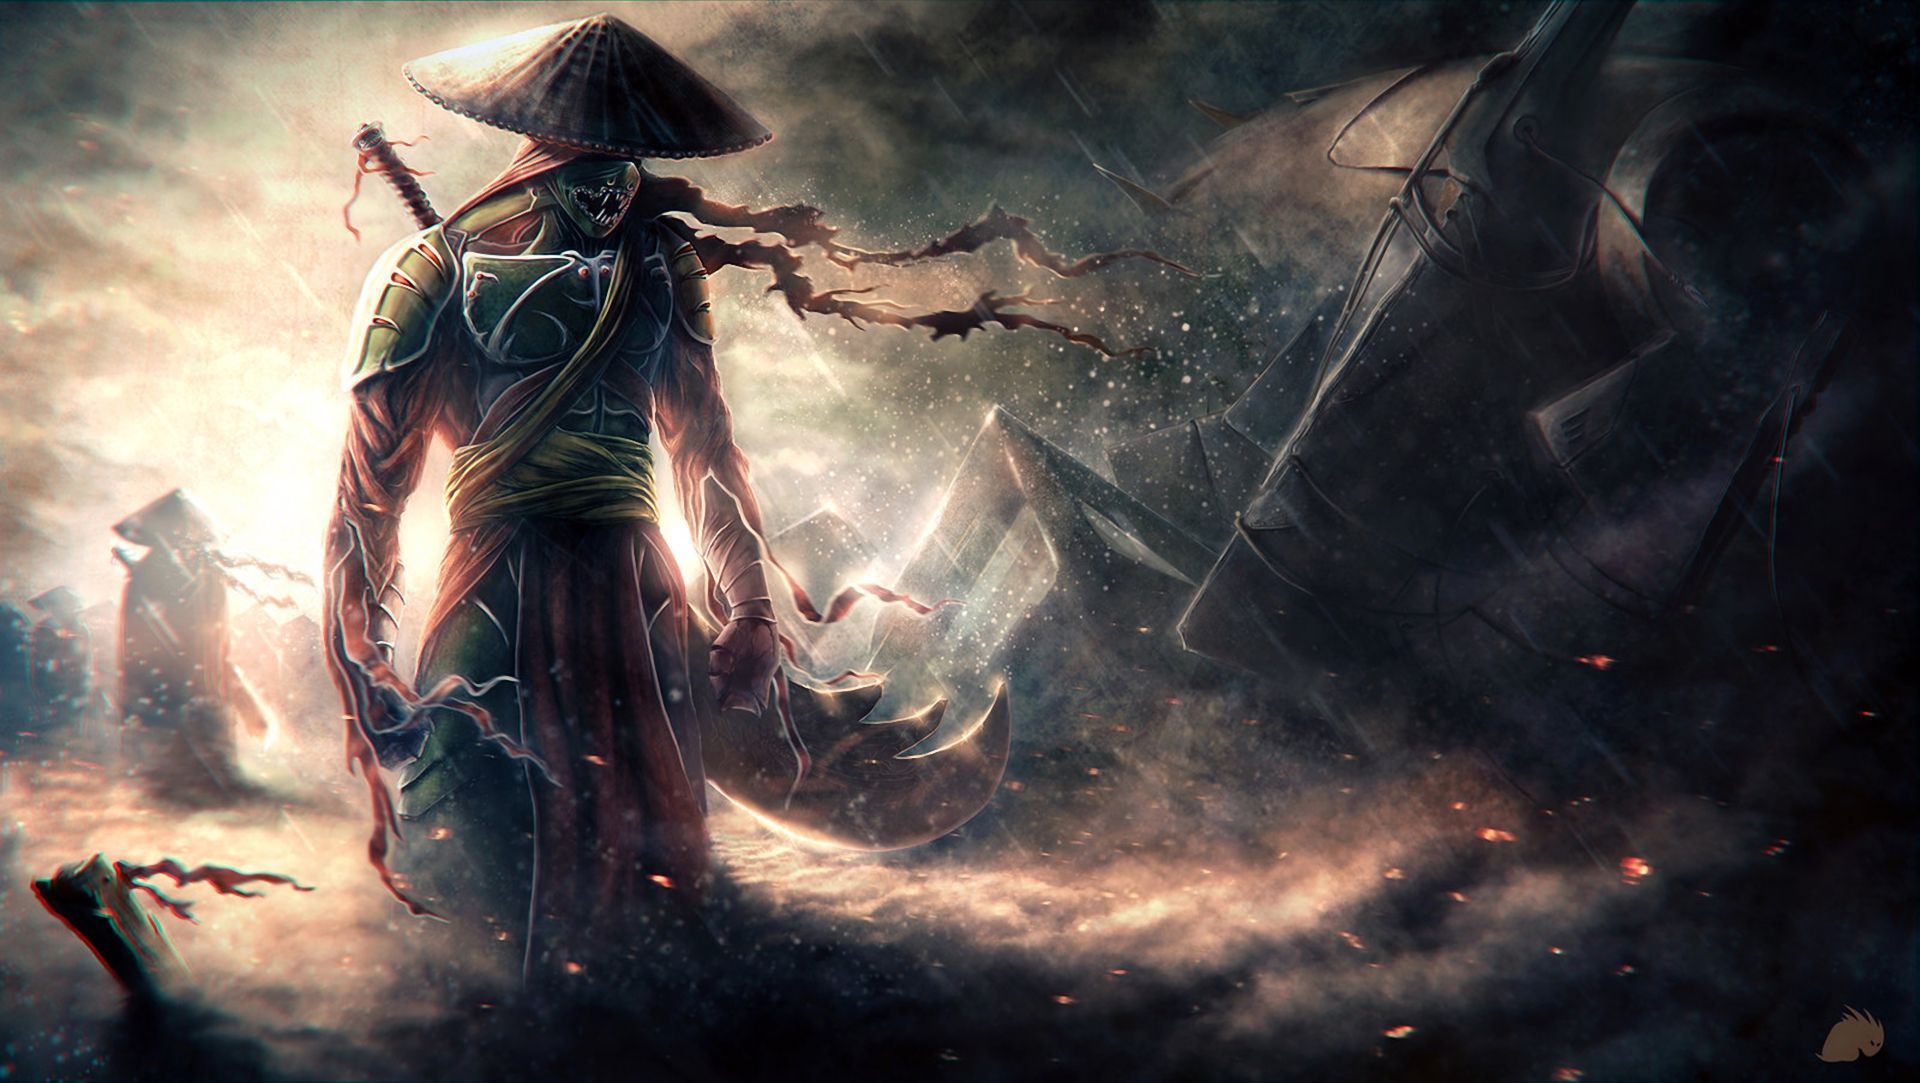 Dead samurai warrior warrior